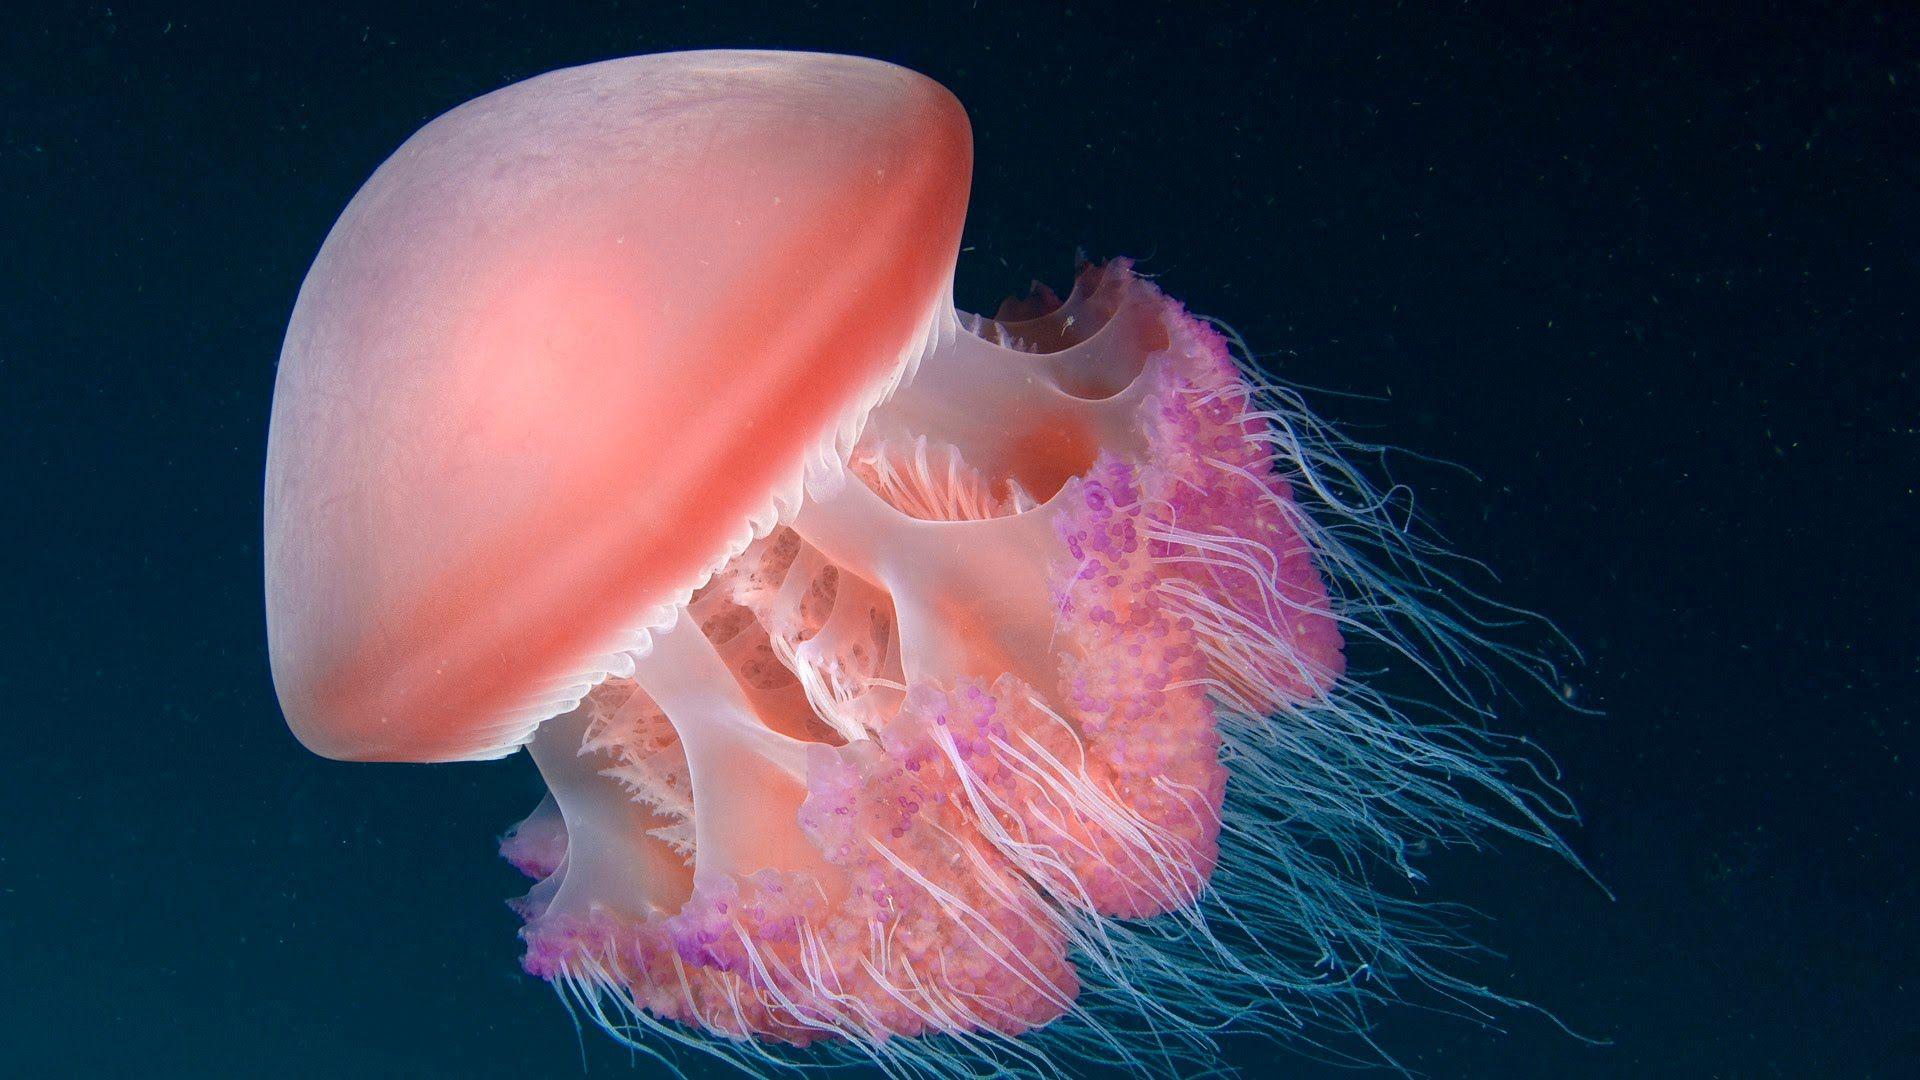 Jellyfish Wallpaper Image